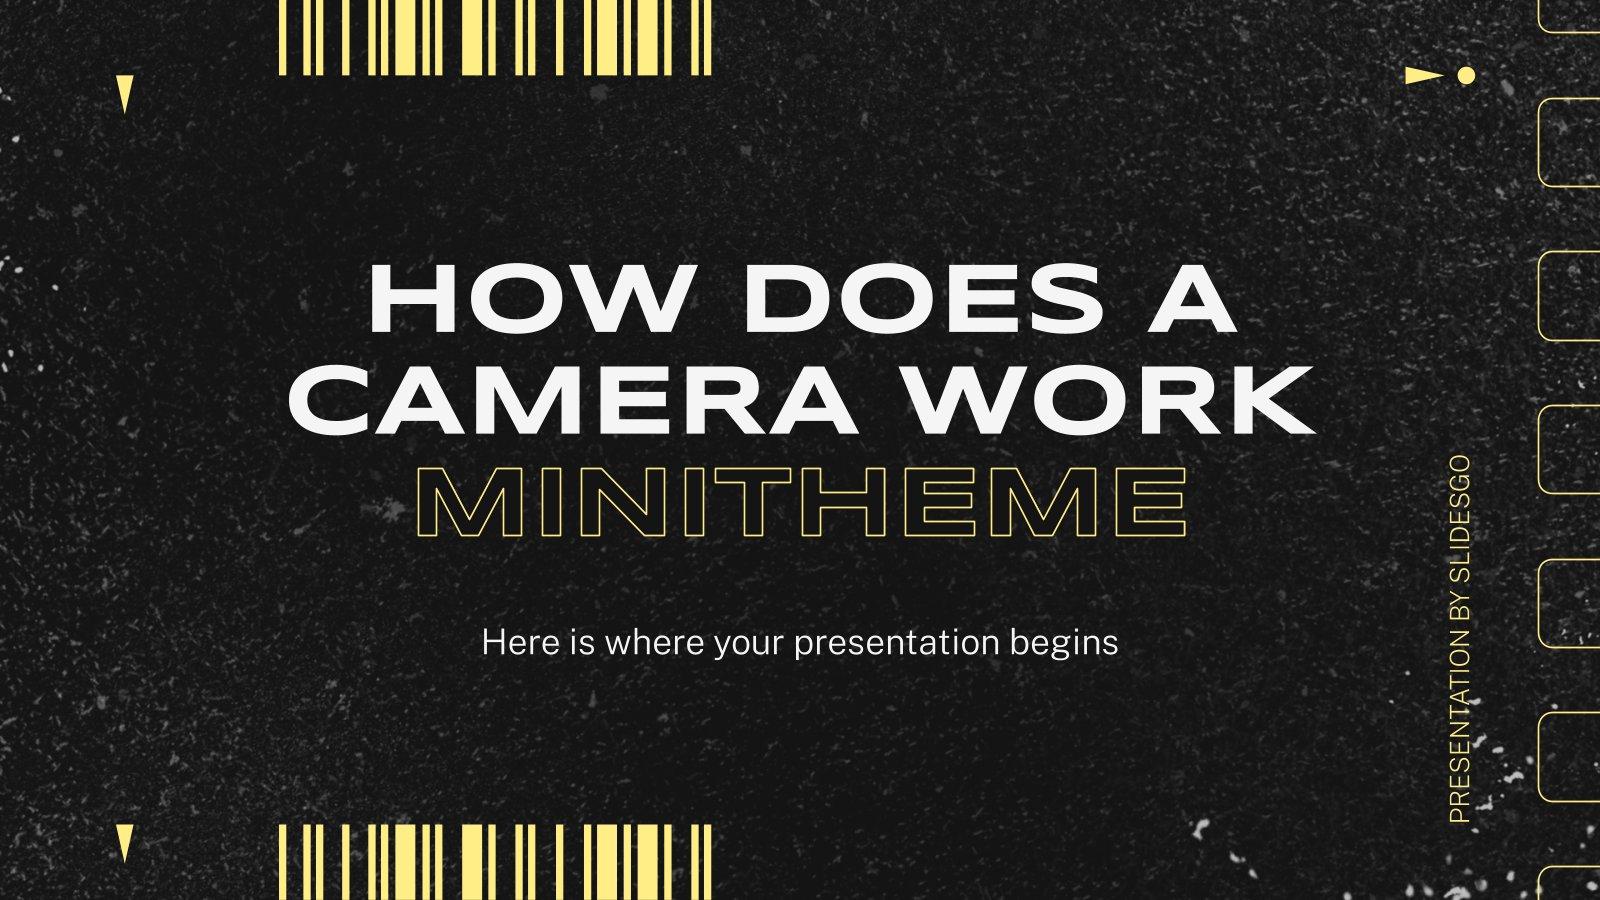 How Does a Camera Work Minitheme presentation template